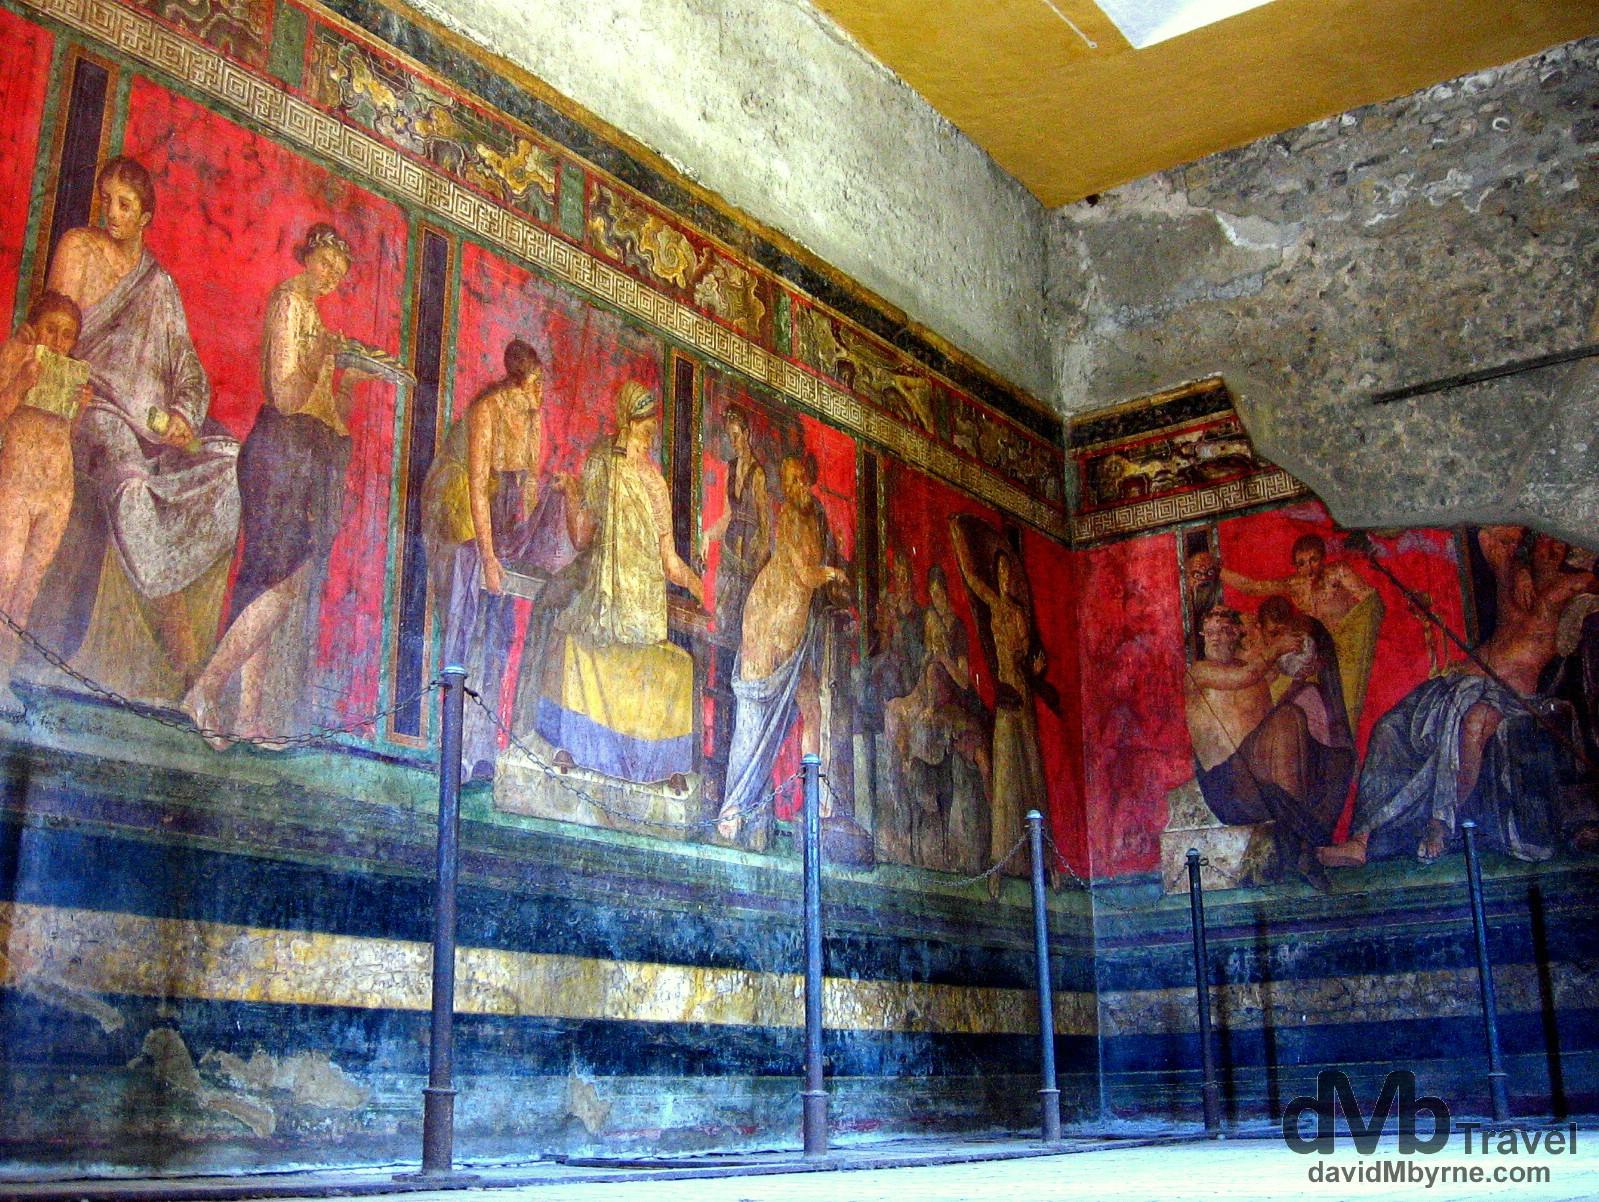 Murals in Villa dei Misteri, Pompeii, Campania, Italy. September 5th, 2007.